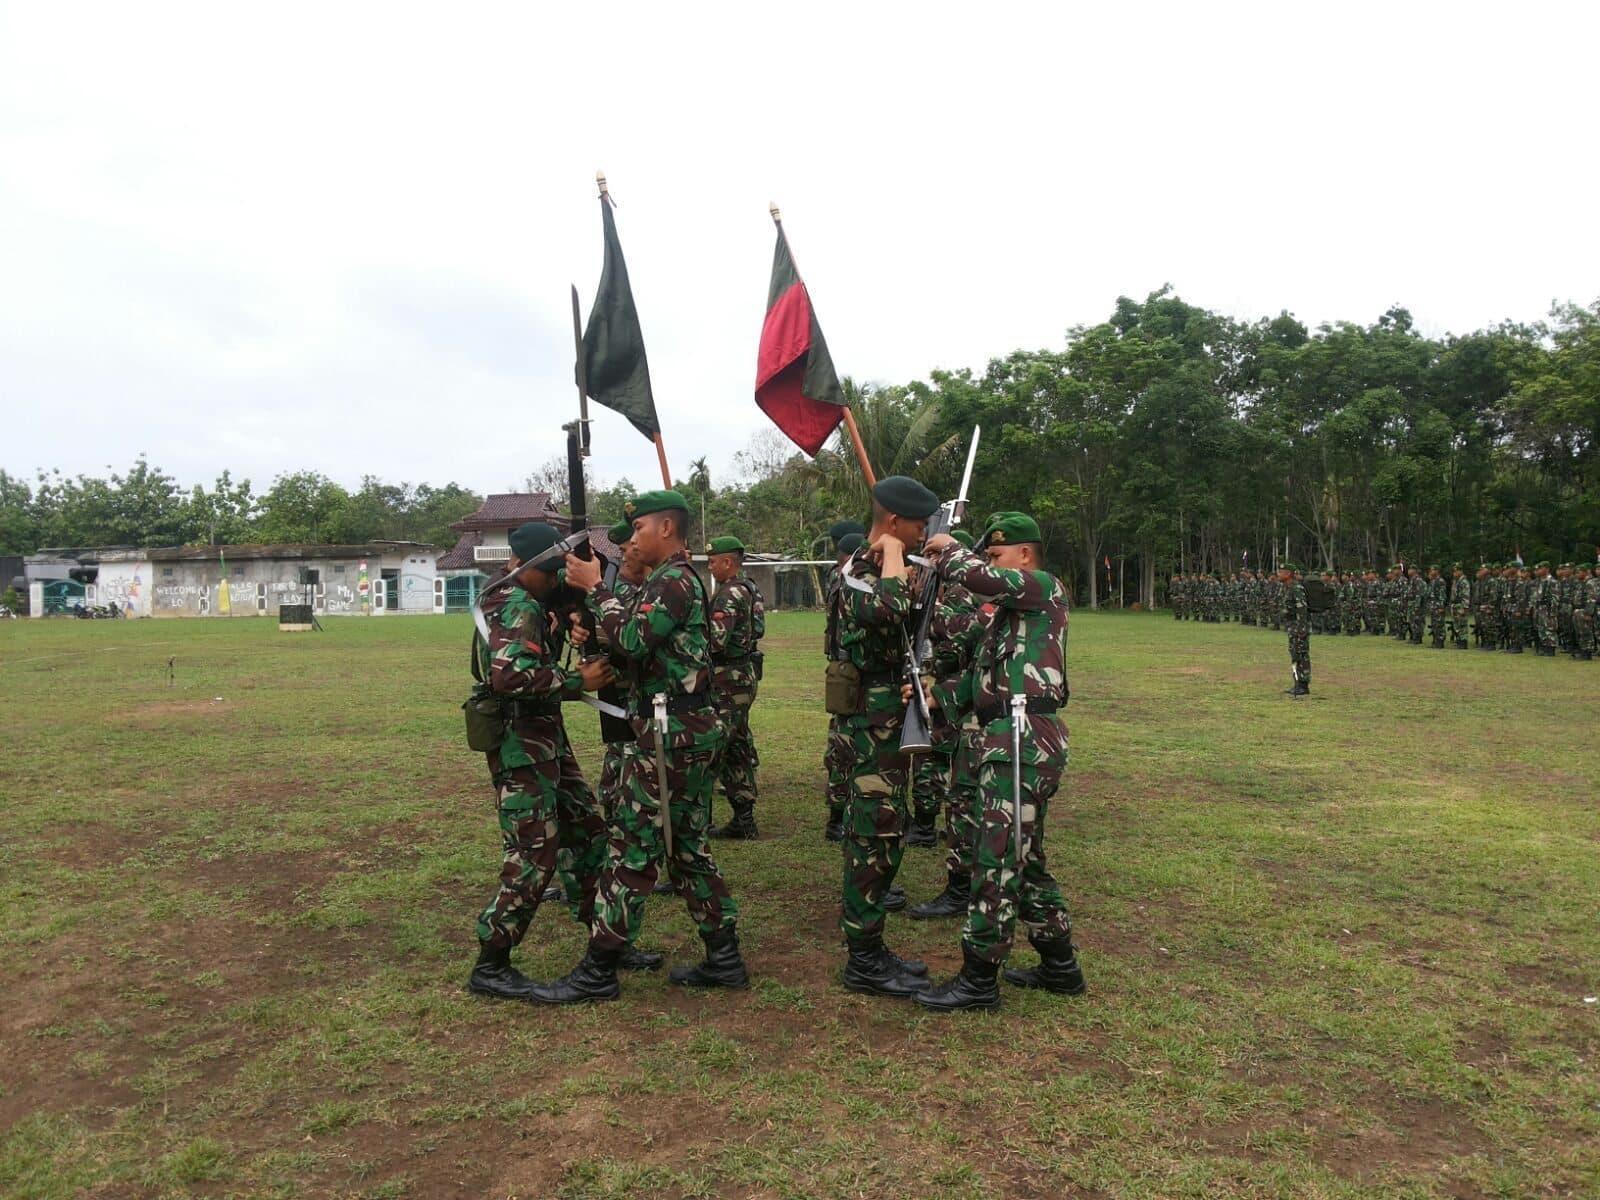 Upacara Pemberangkatan Peleton Beranting Yudha Wastu Pramuka Jaya Tahun 2015